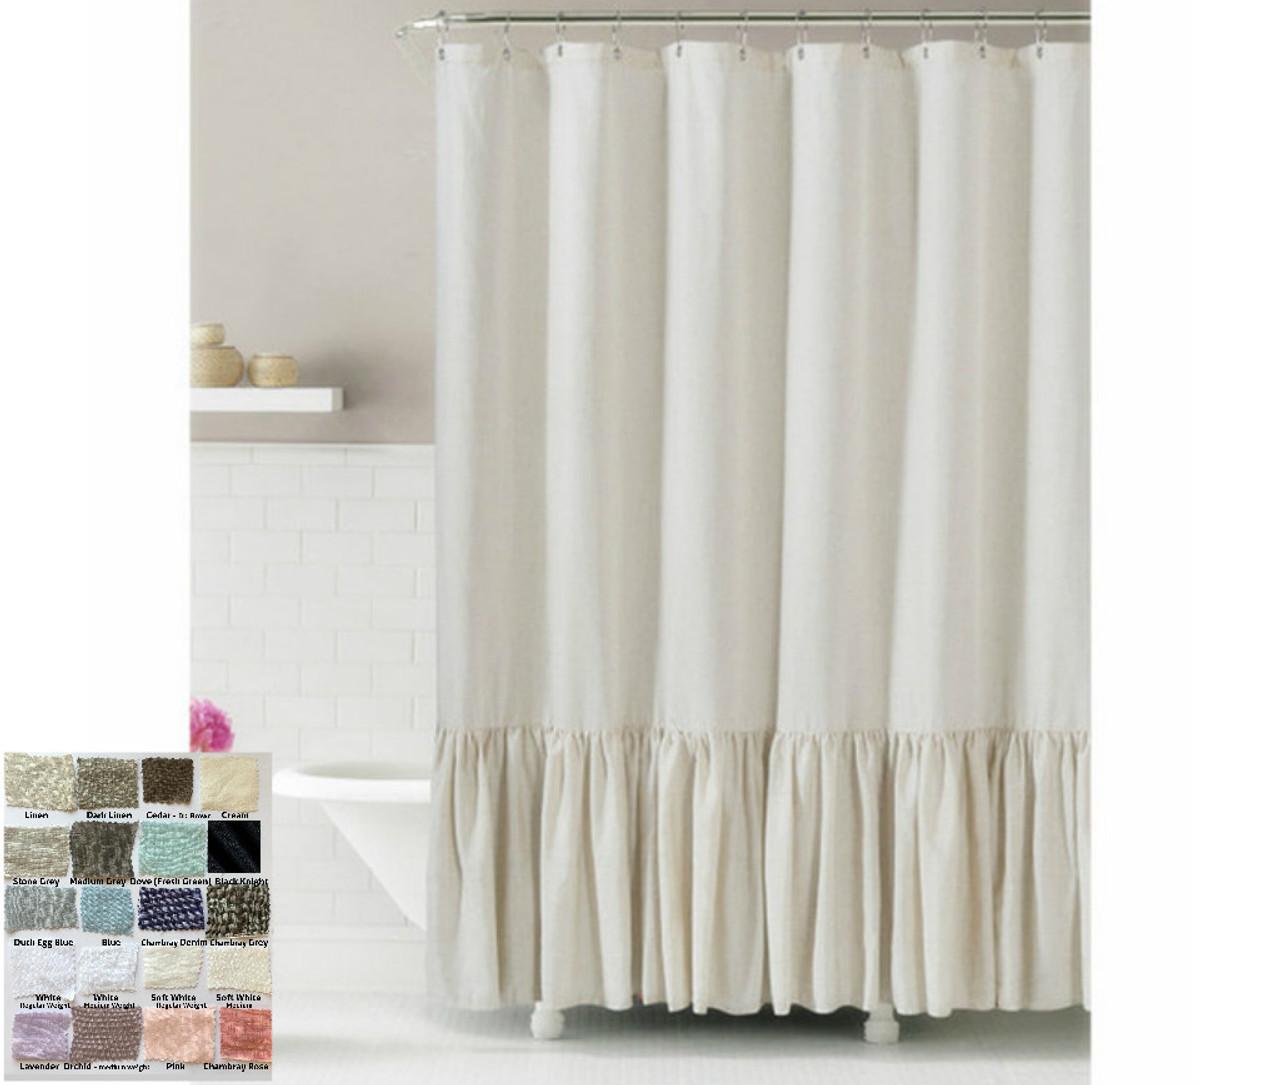 Linen Shower Curtain with Mermaid Long Ruffles